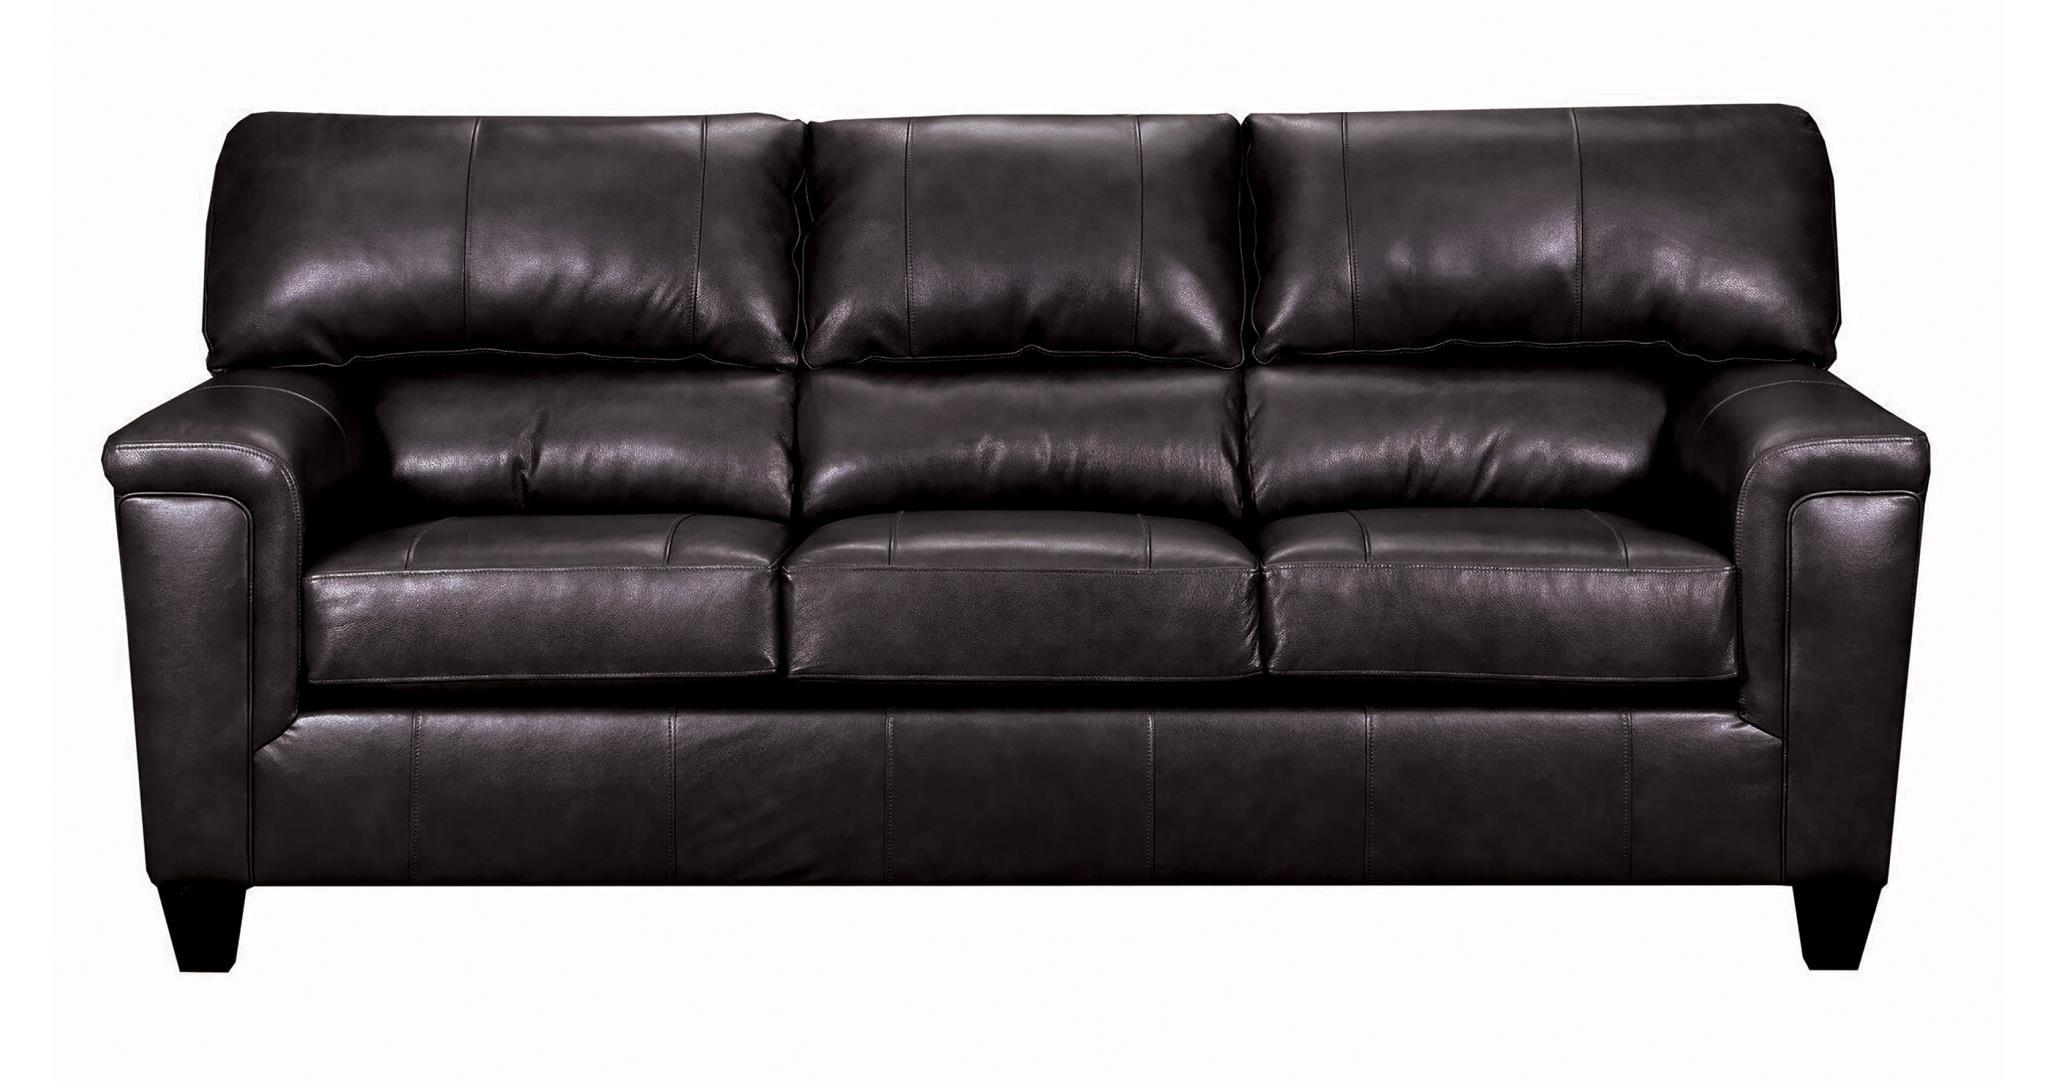 55765 phygia espresso brown leather sofa